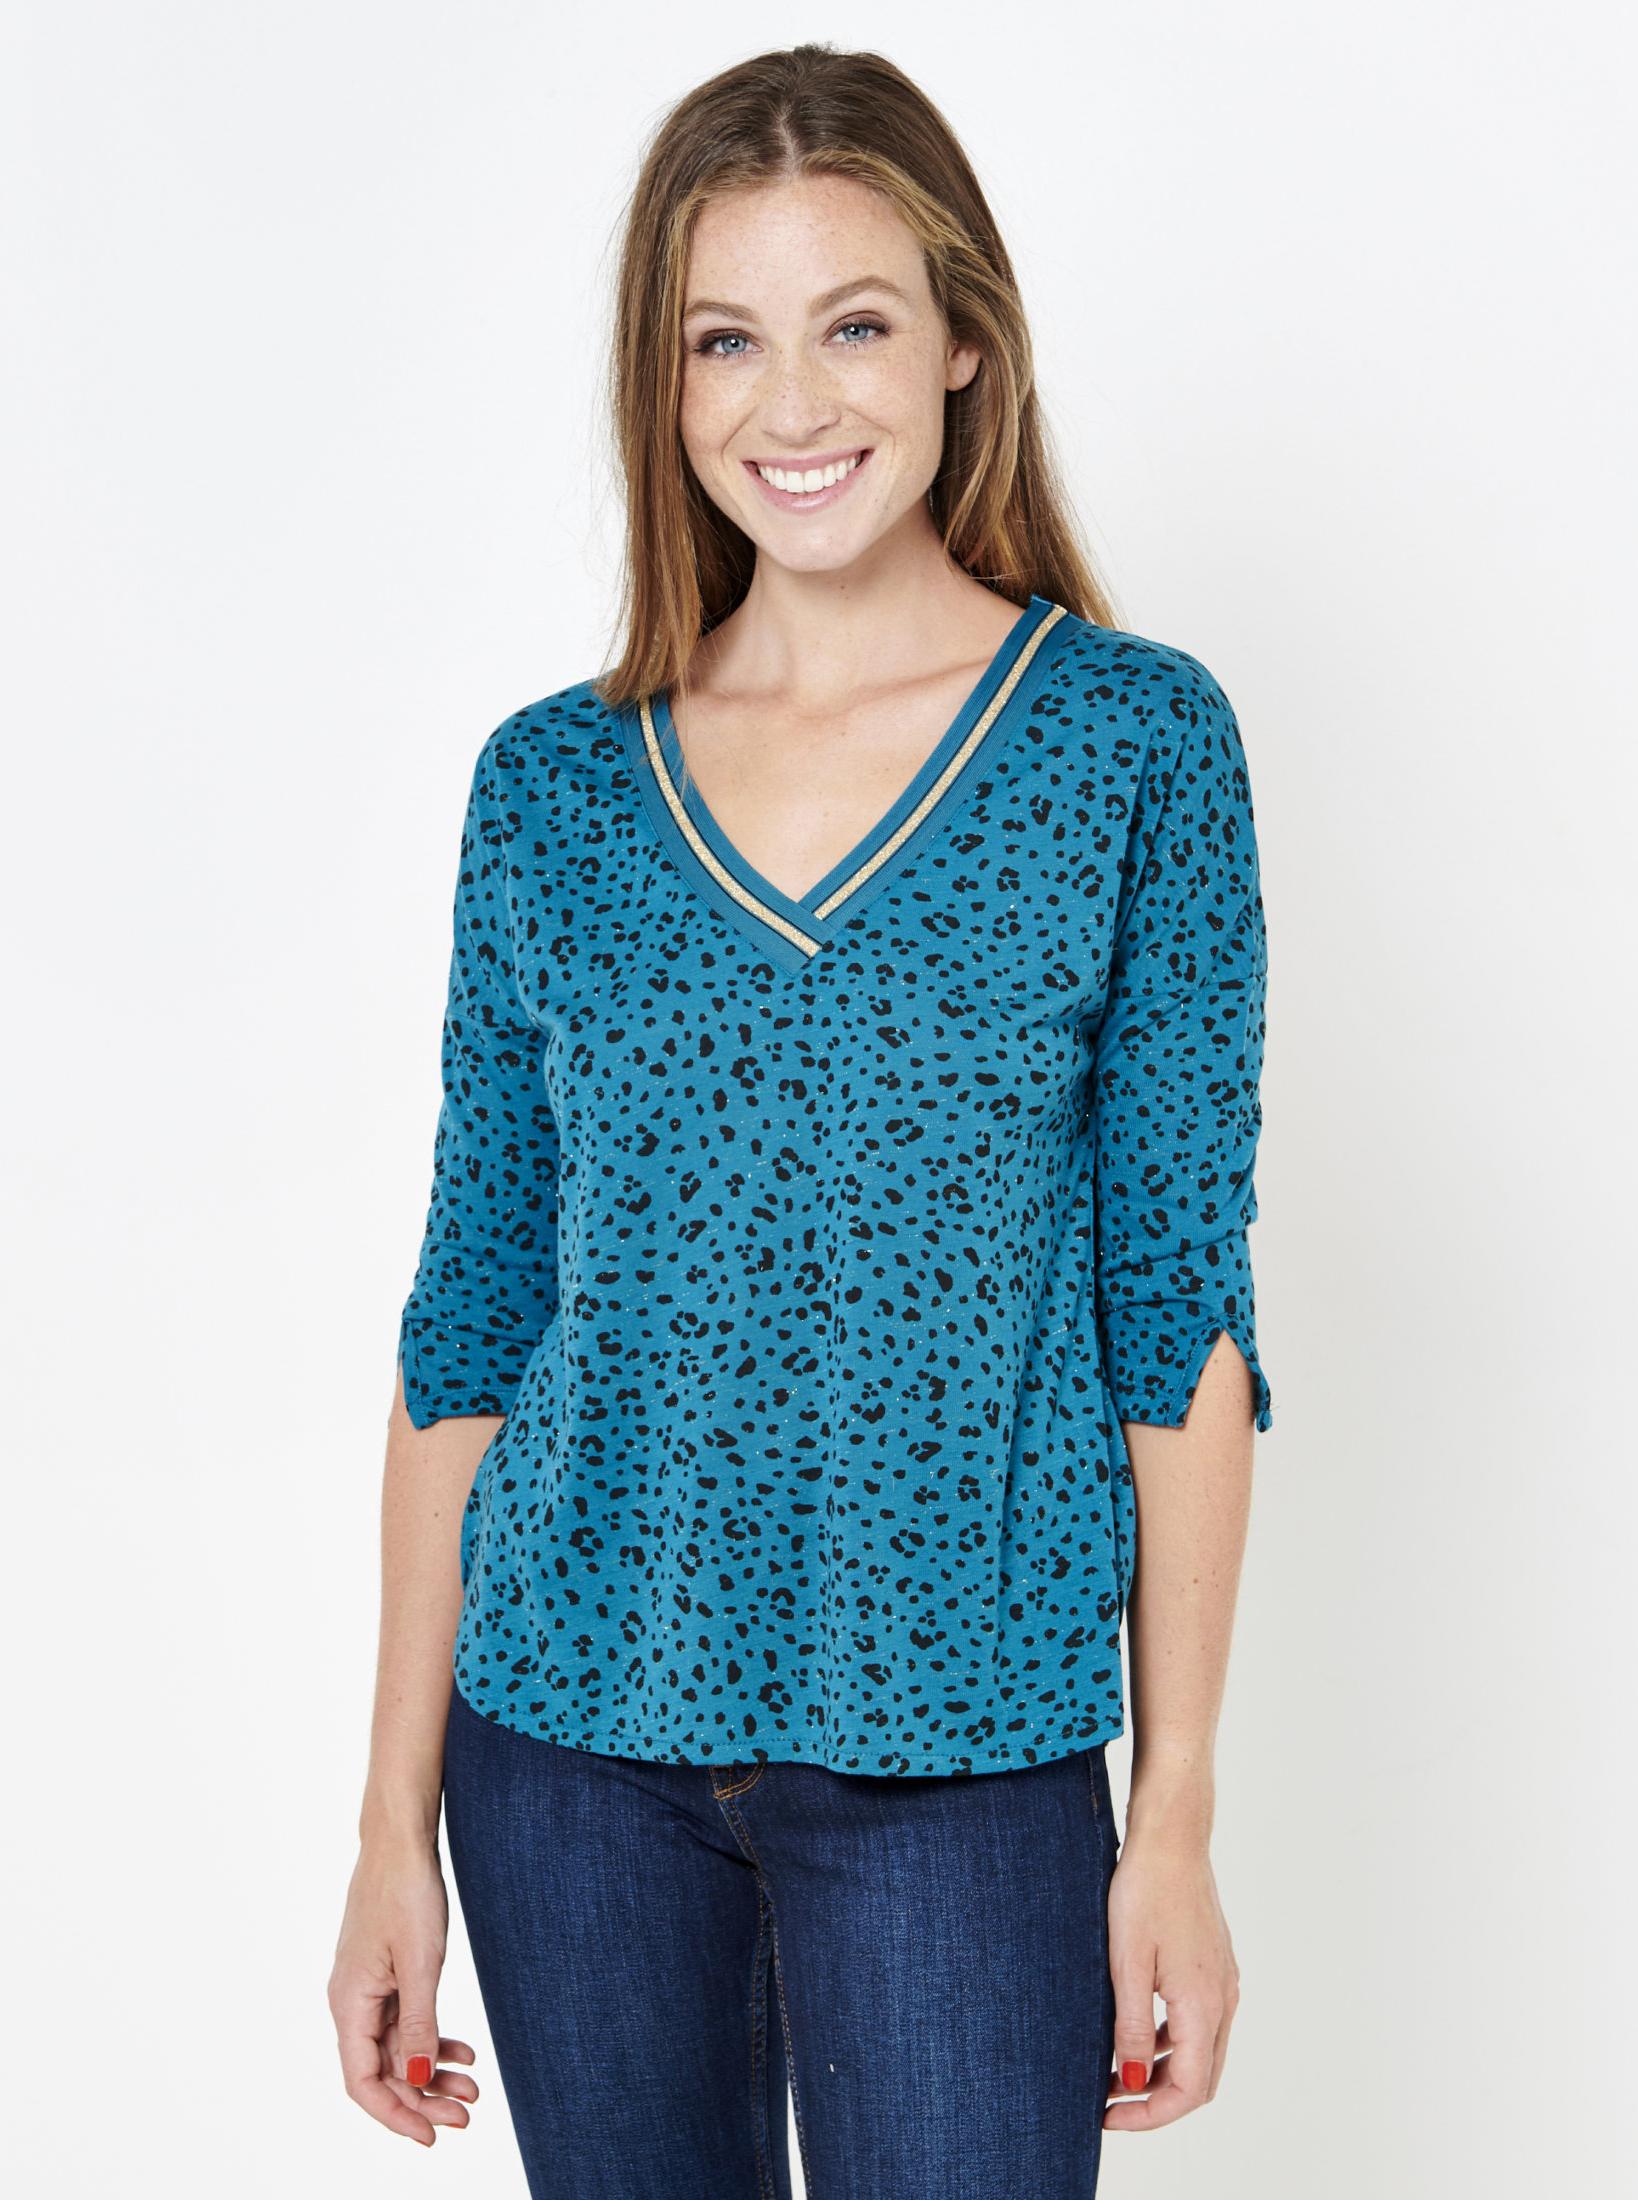 CAMAIEU modra majica z živalskim vzorcem